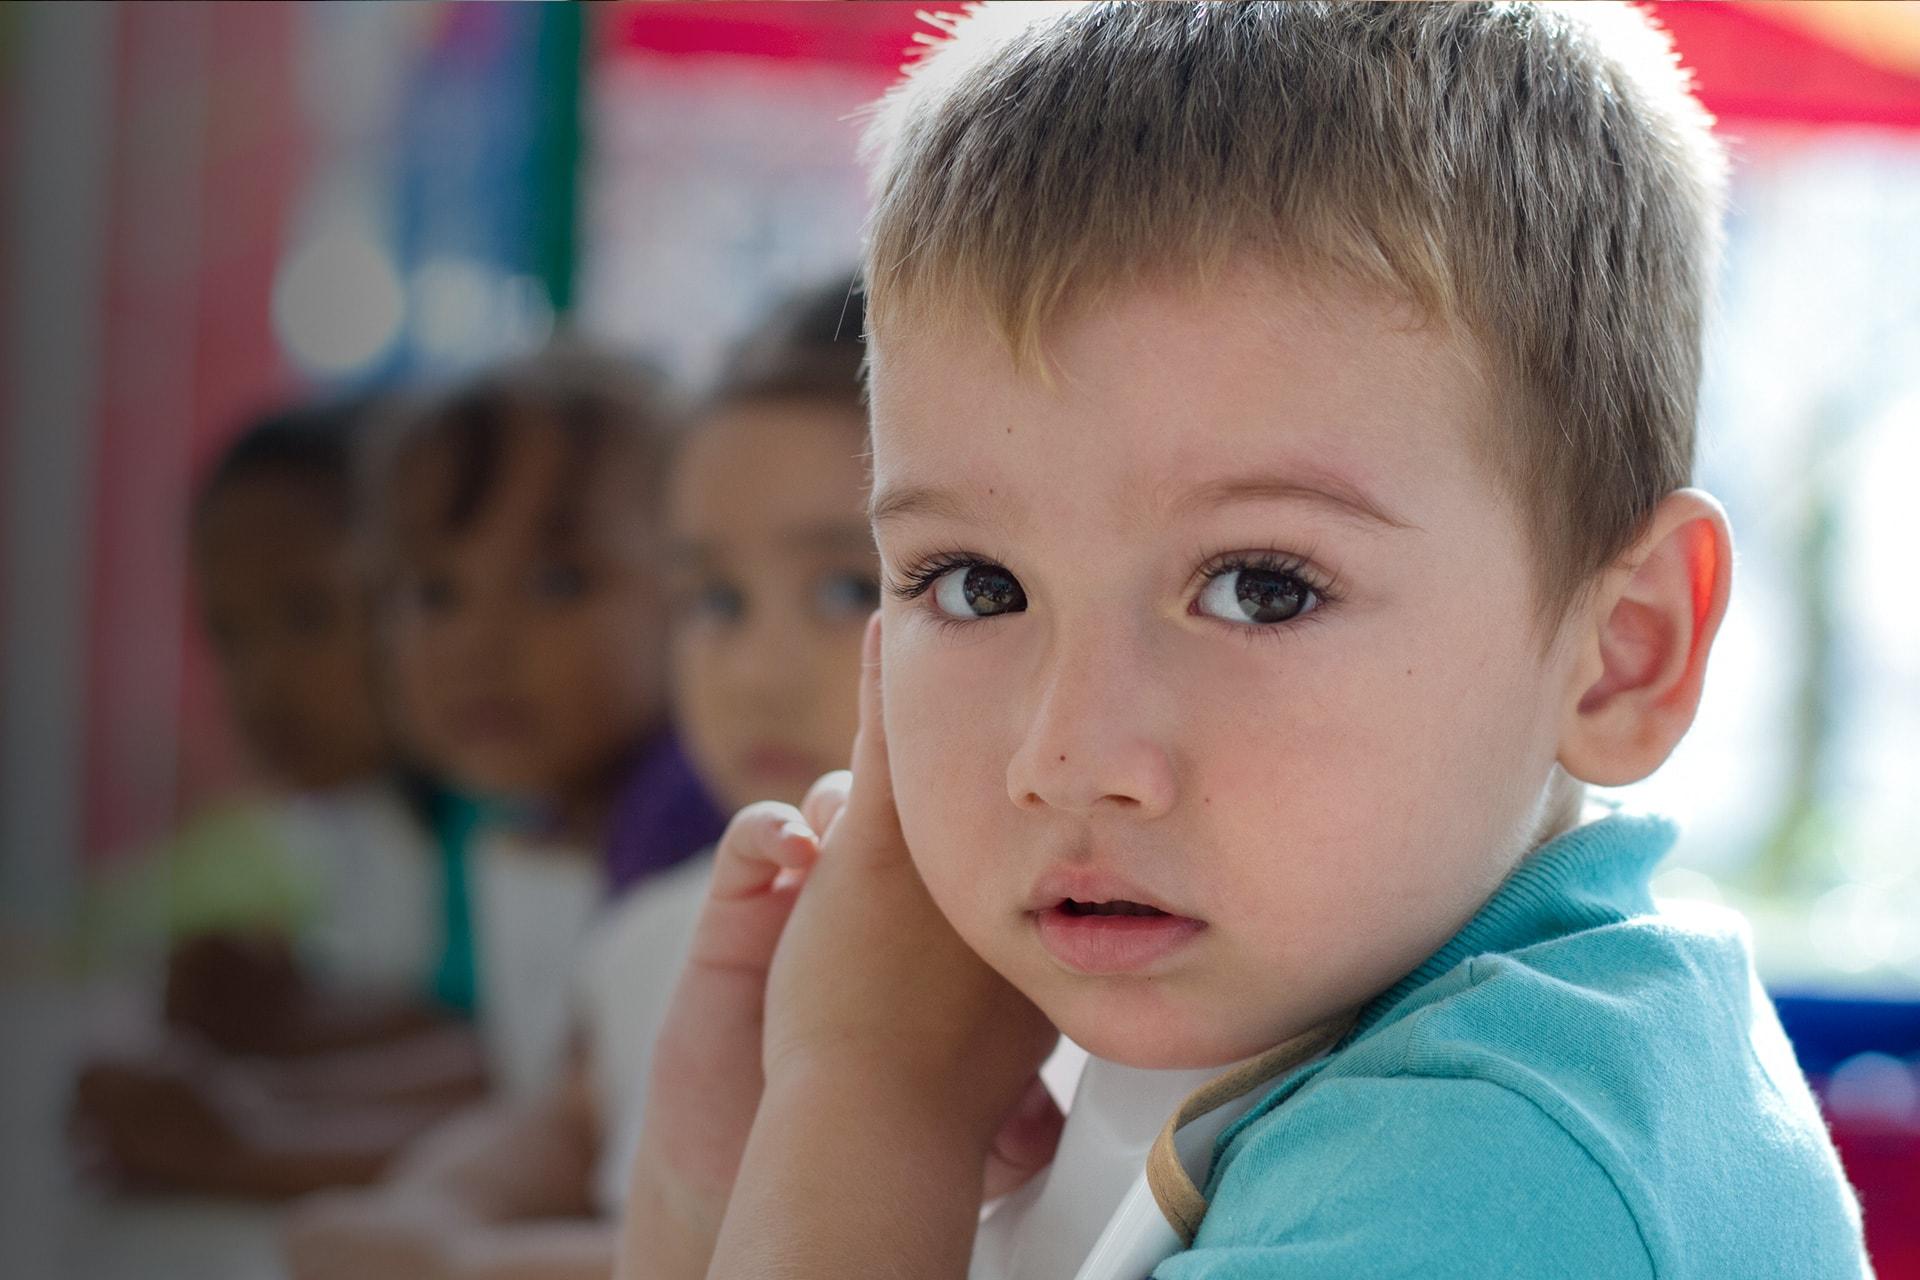 Colabora con nosotros - Aldeas Infantiles SOS de España